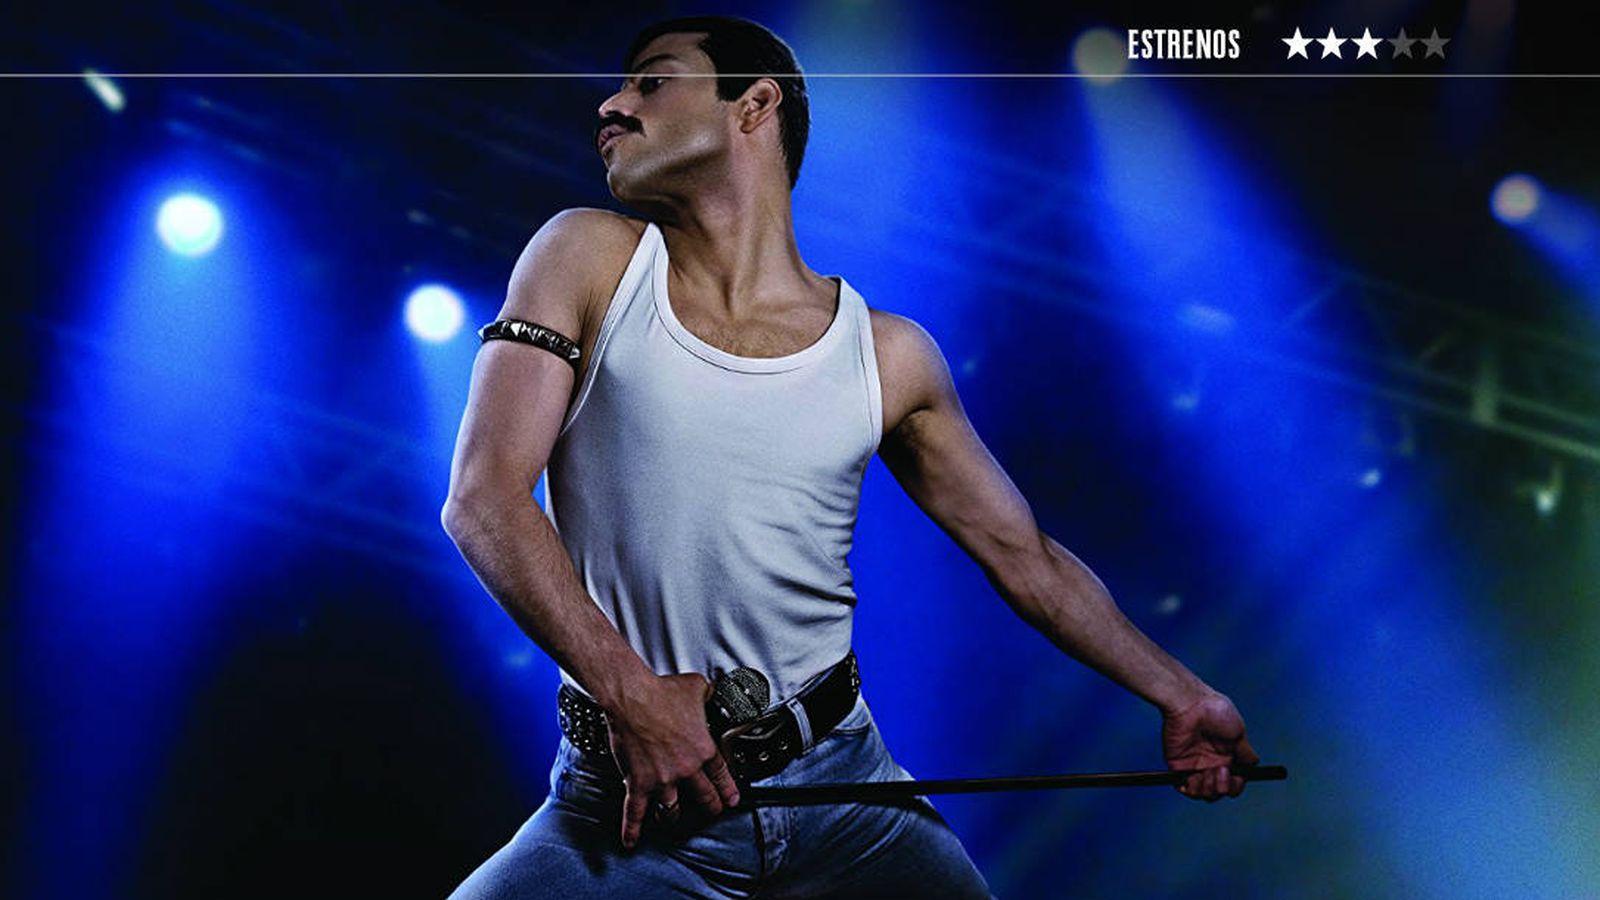 Foto: Rami Malek es Freddie Mercury en 'Bohemian Rhapsody'. (Fox)